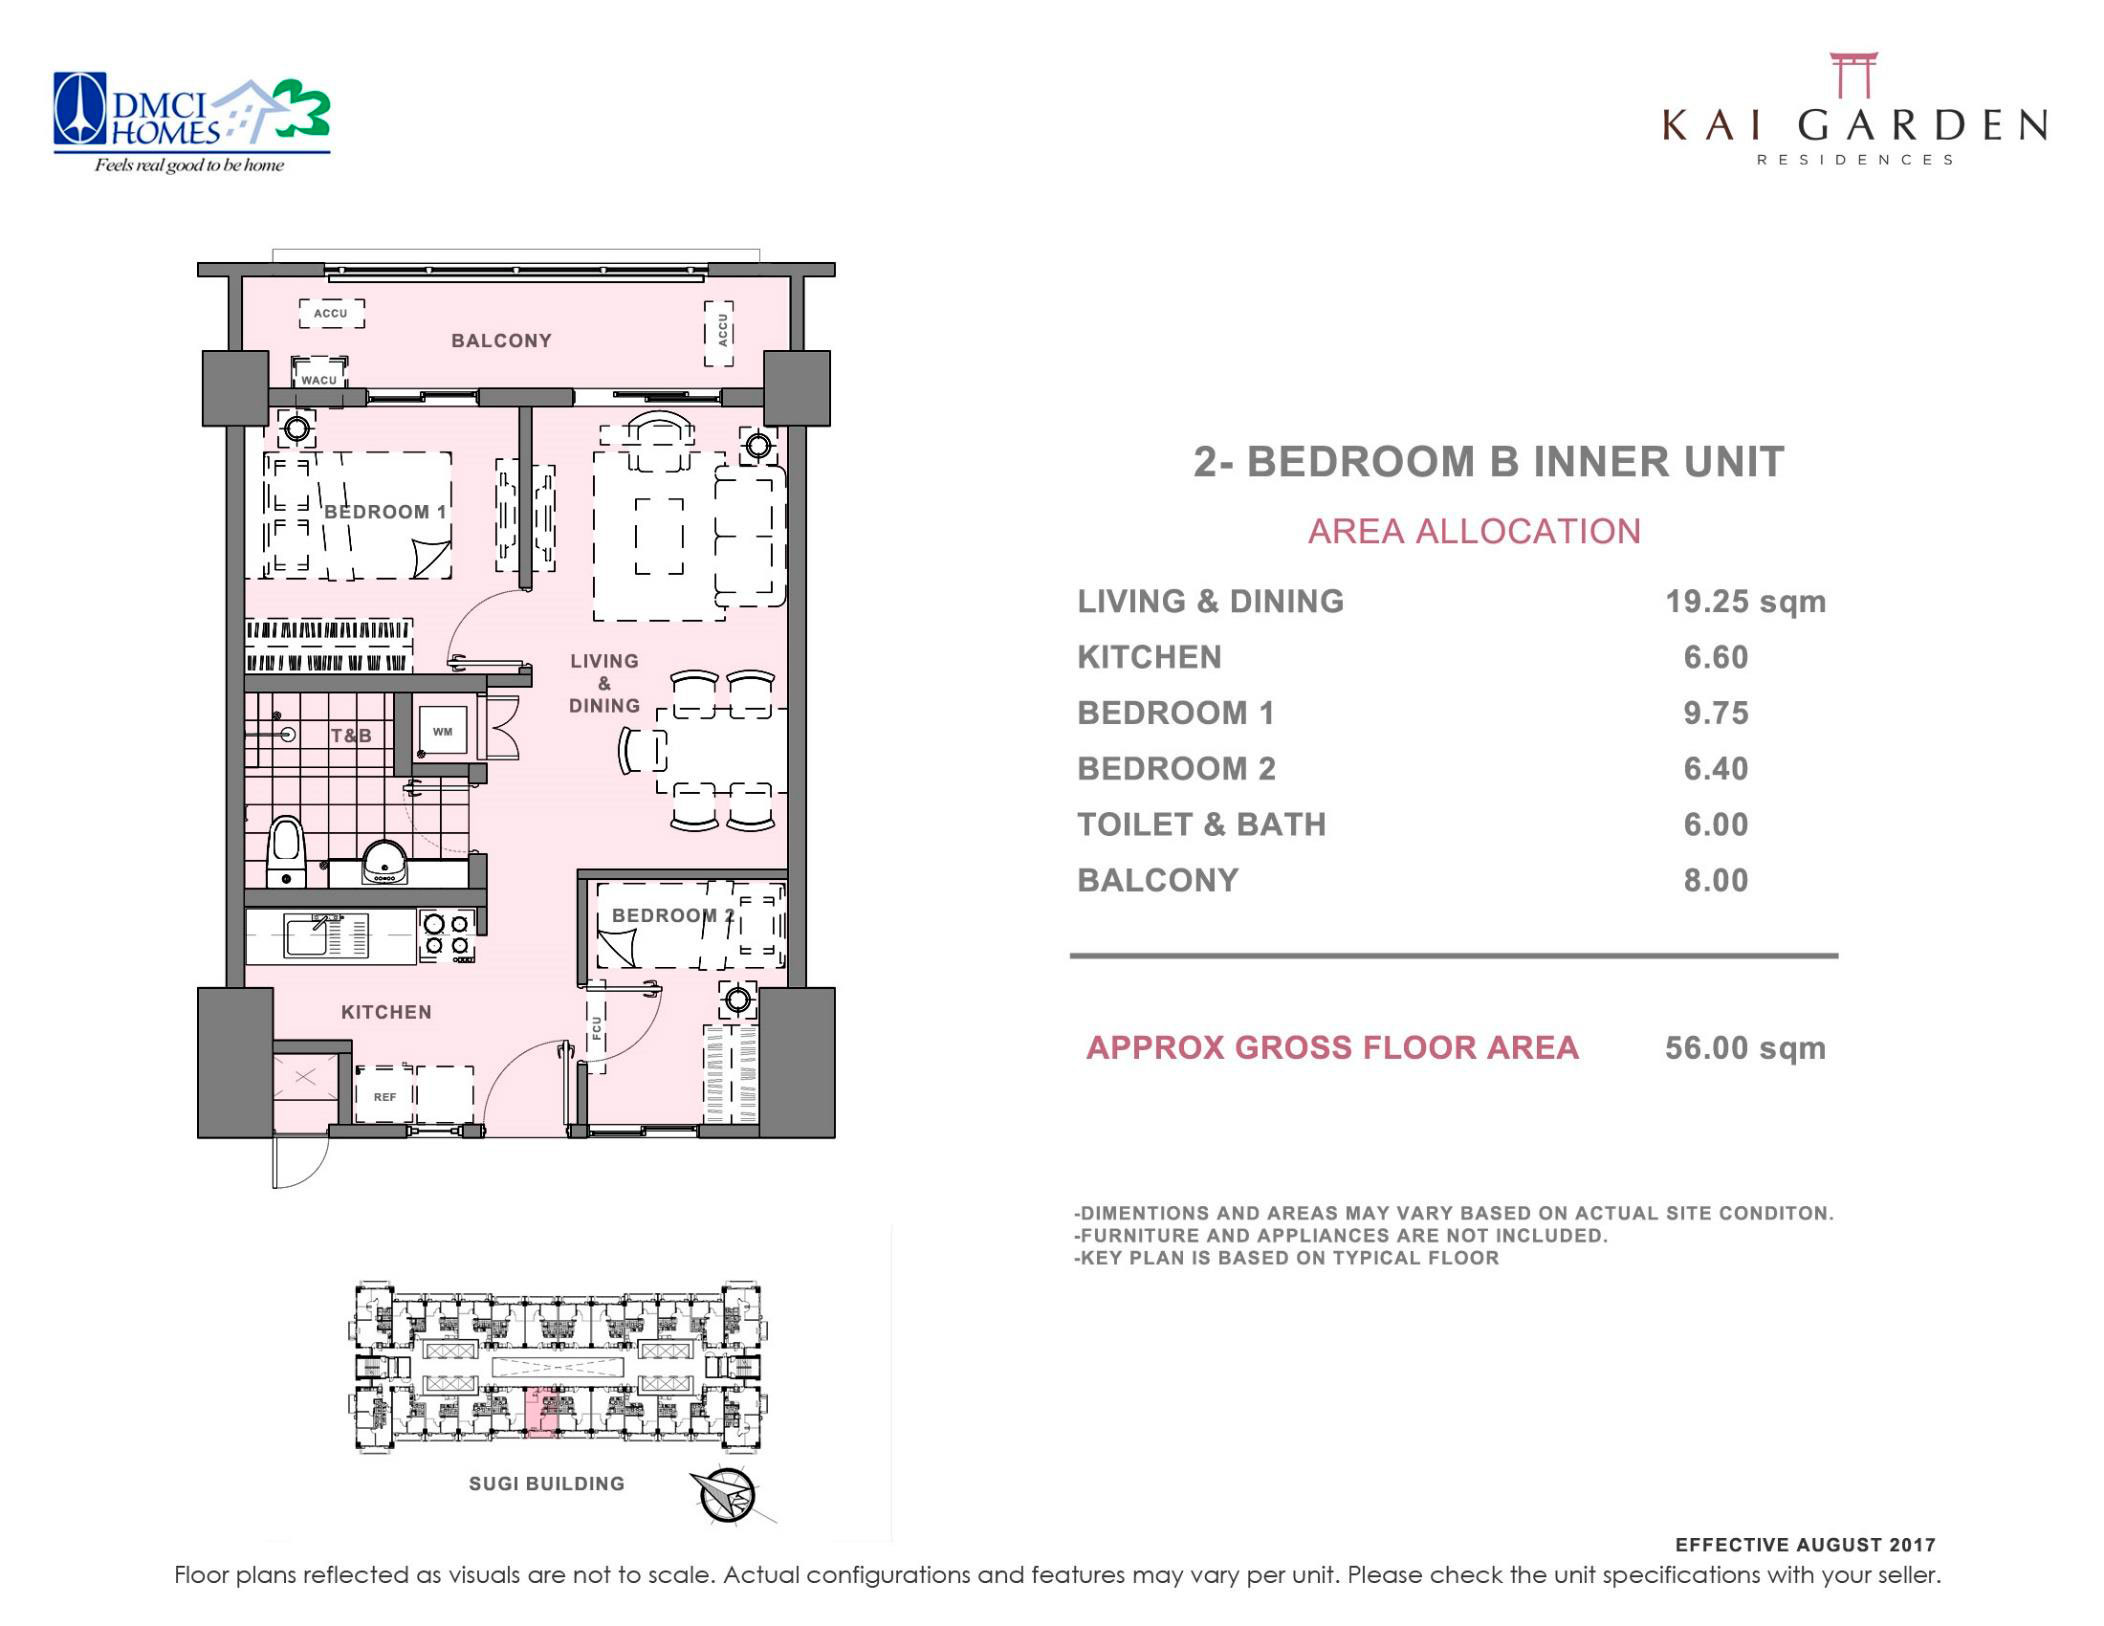 Kai Garden Residences Mandaluyong Dmci Homes Online